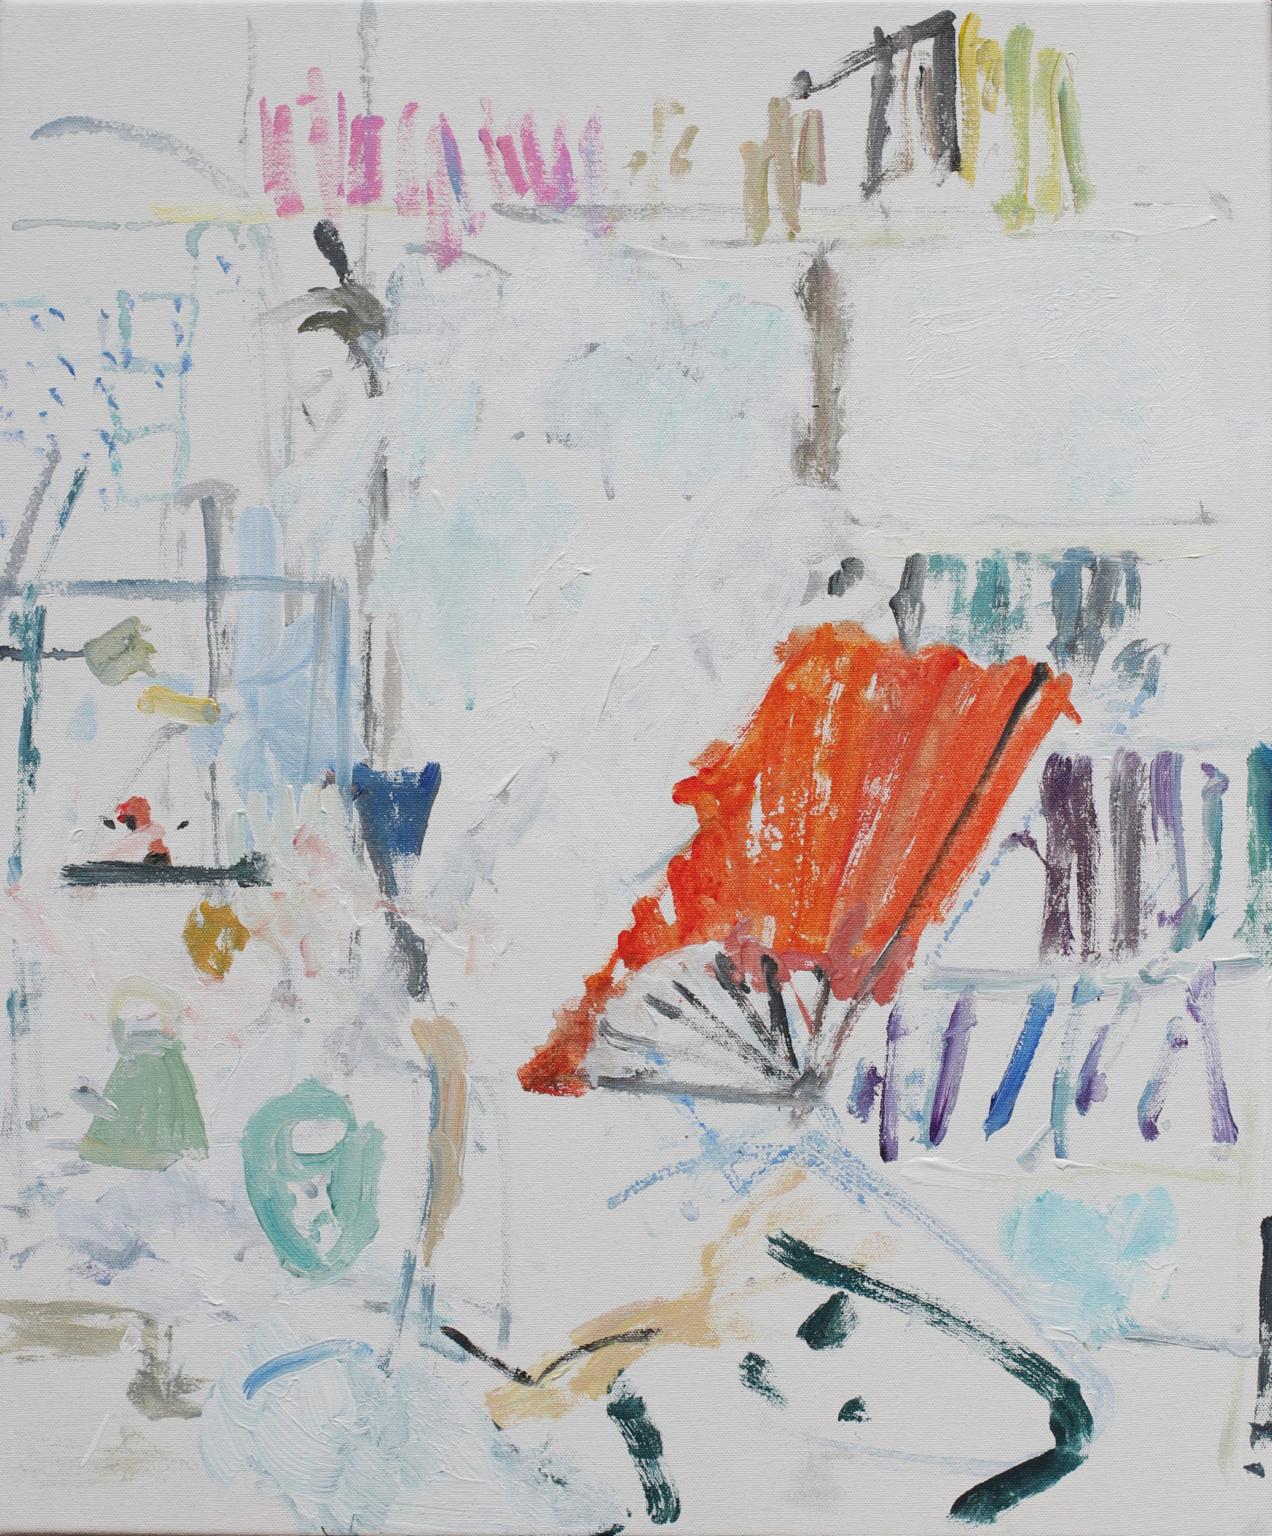 Nick Trench, Caroline with Fan I (2017), Acrylic on canvas, 51 x 61 cm